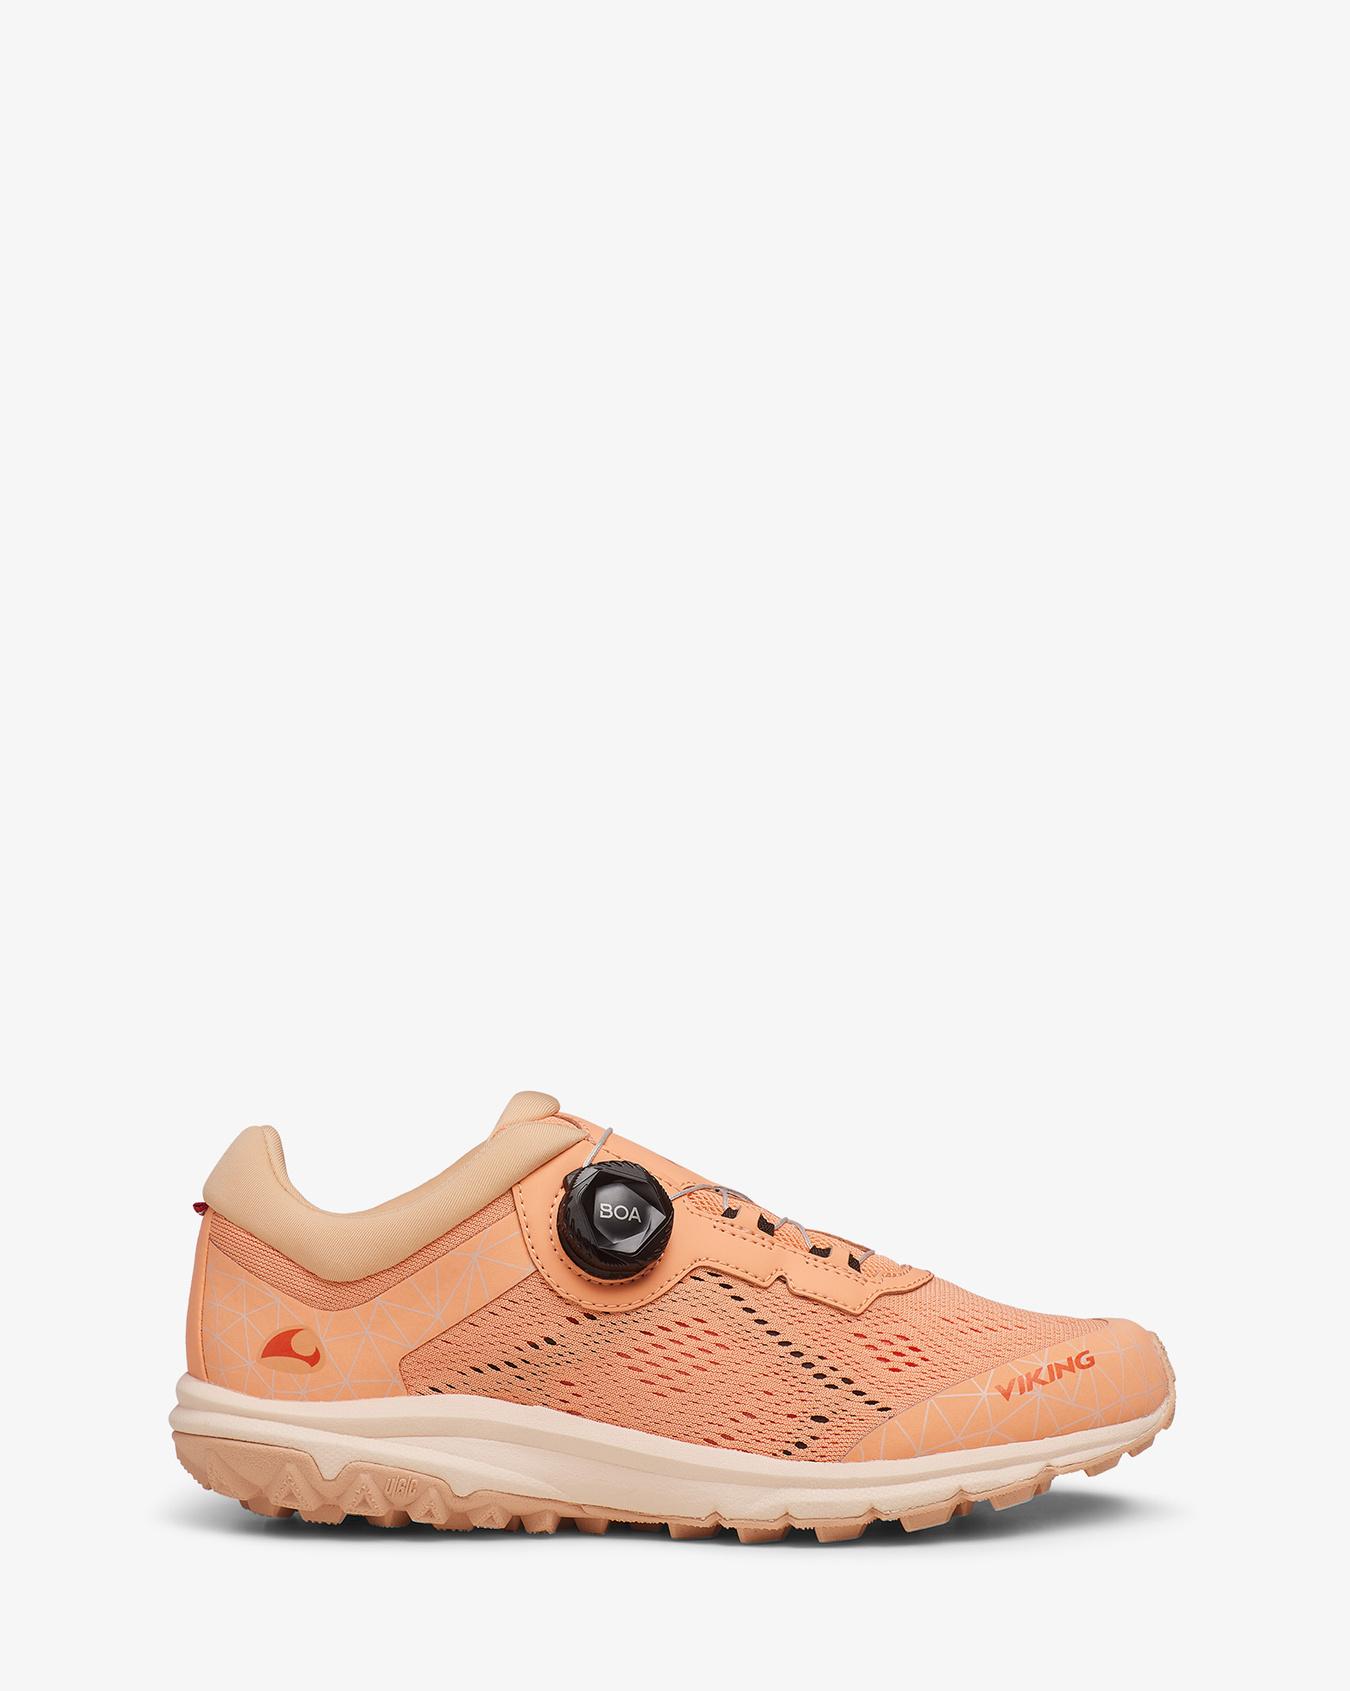 Apex Side Boa W Hiking Shoe